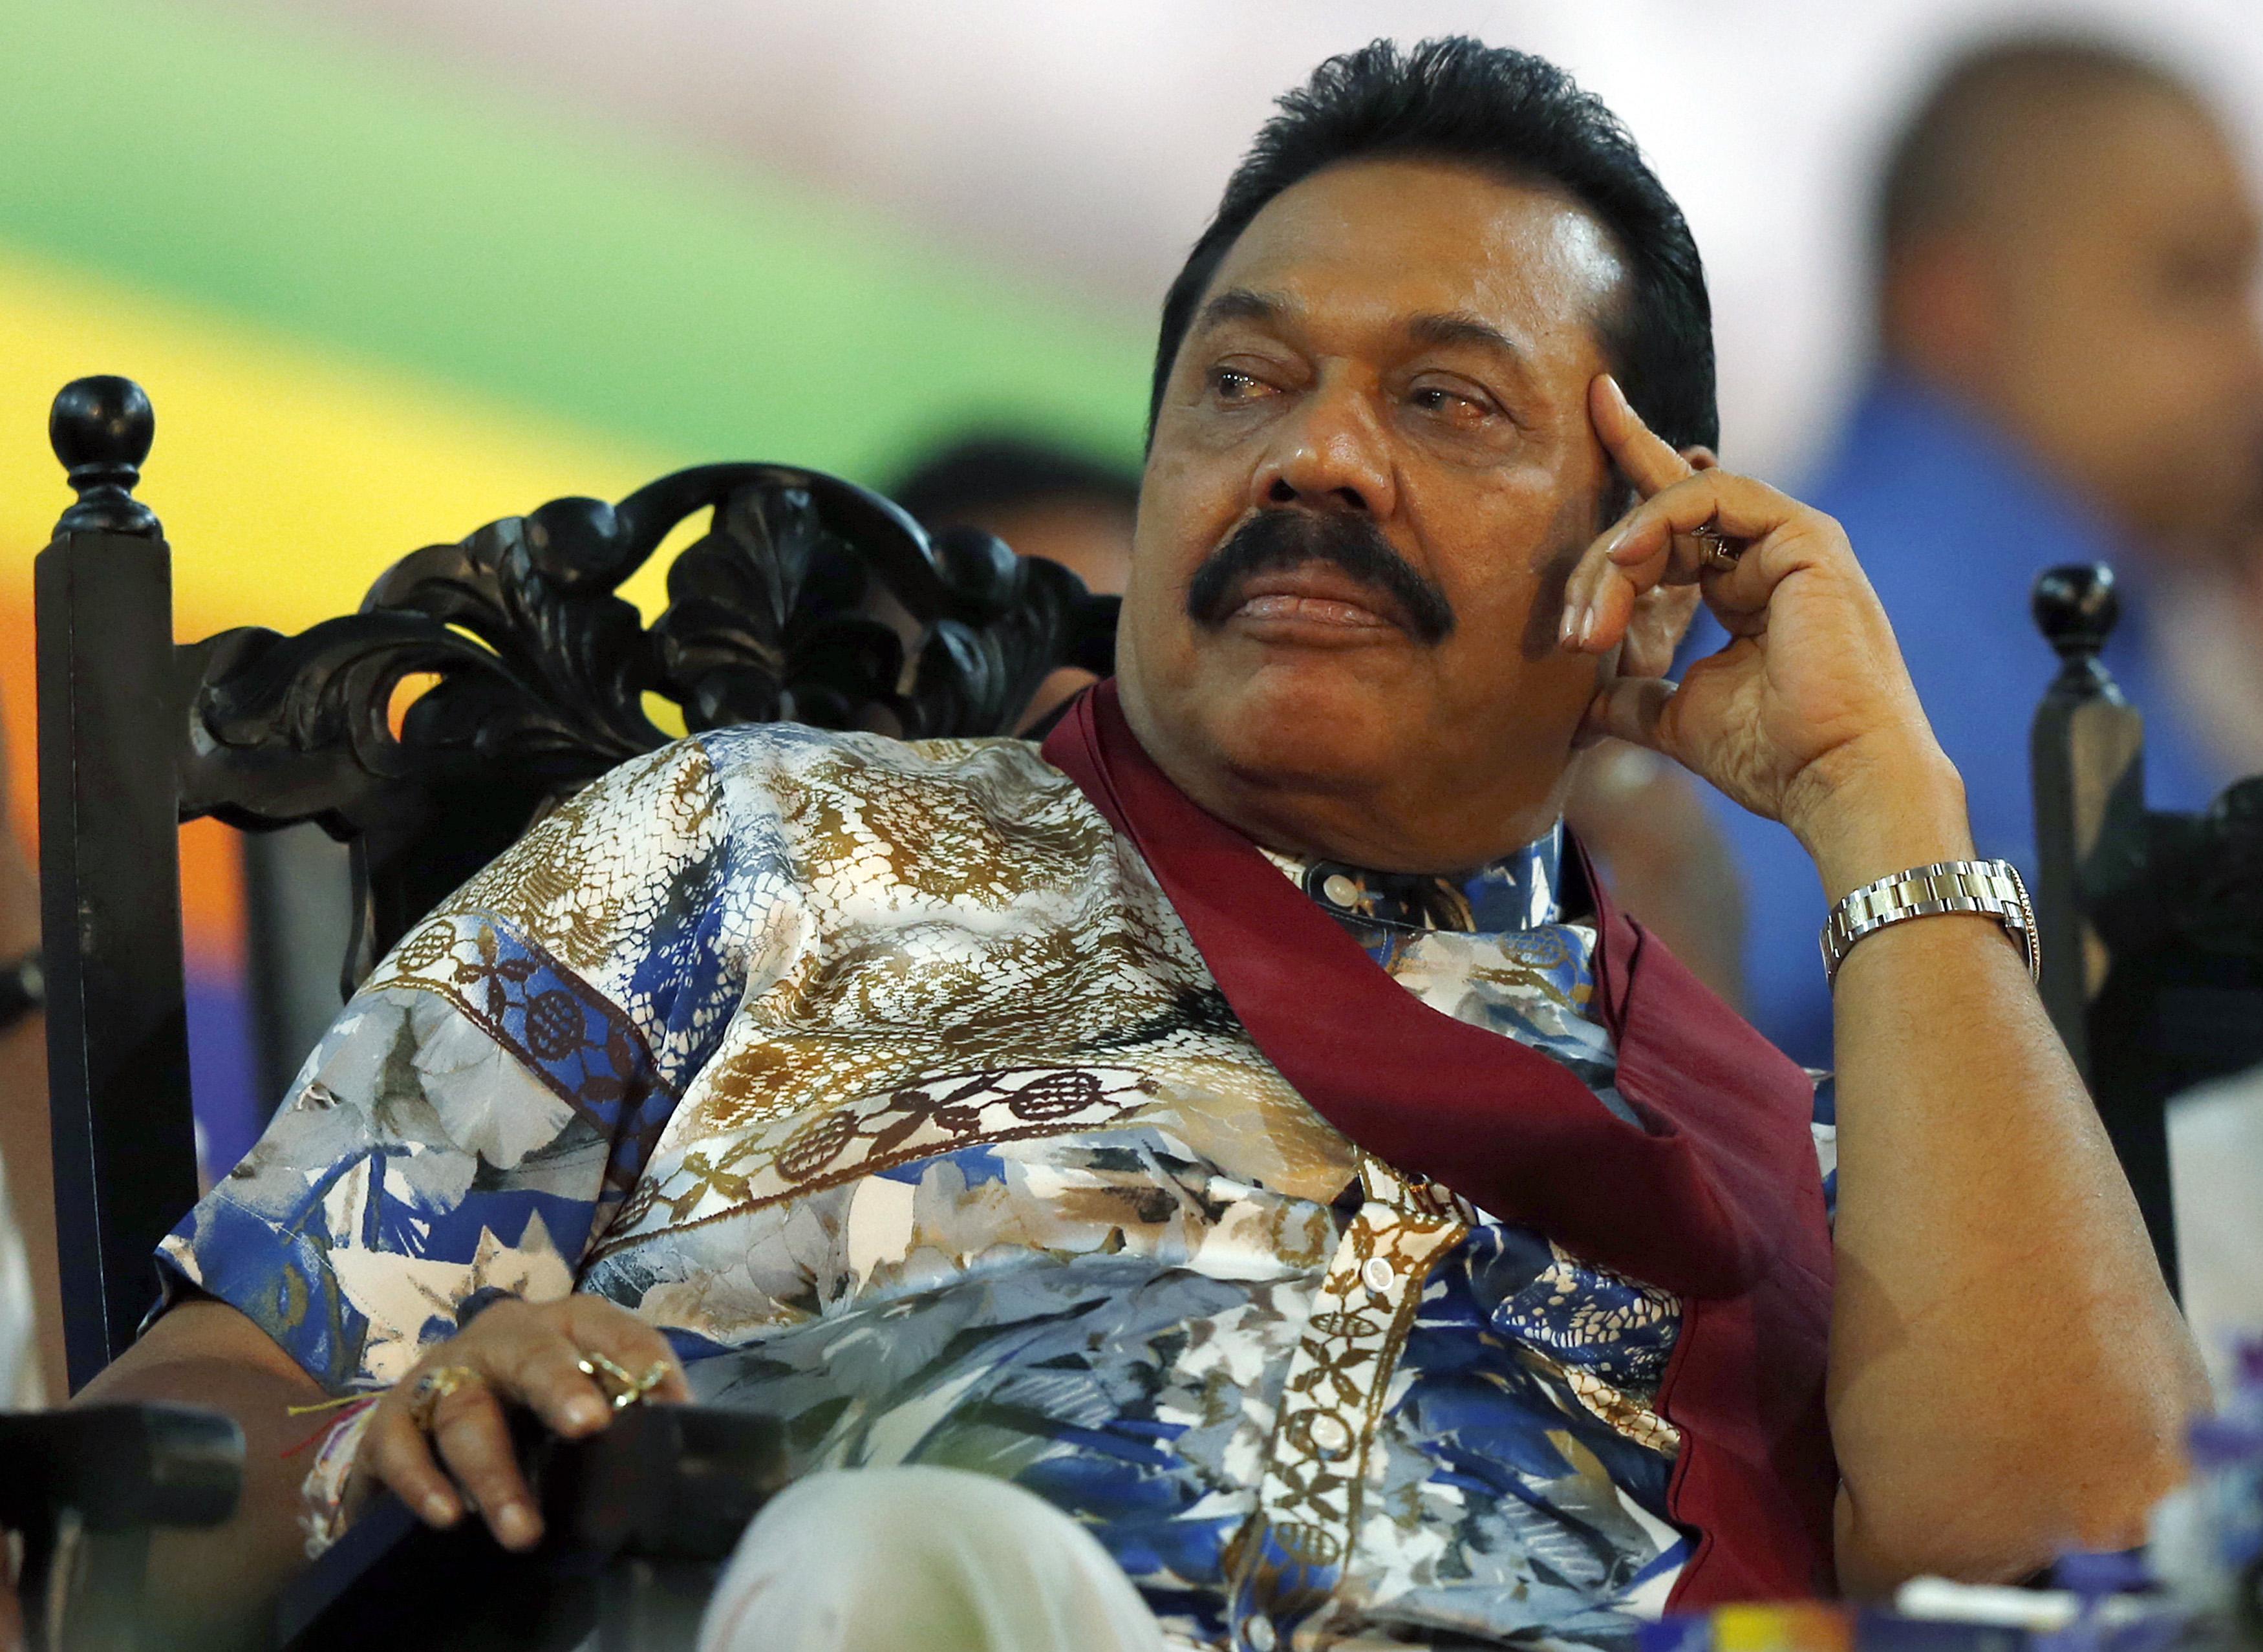 Sri Lankan President Mahinda Rajapaksa listens to a speech during his final rally ahead of the presidential election in Piliyandala, Sri Lanka, on Jan. 5, 2015